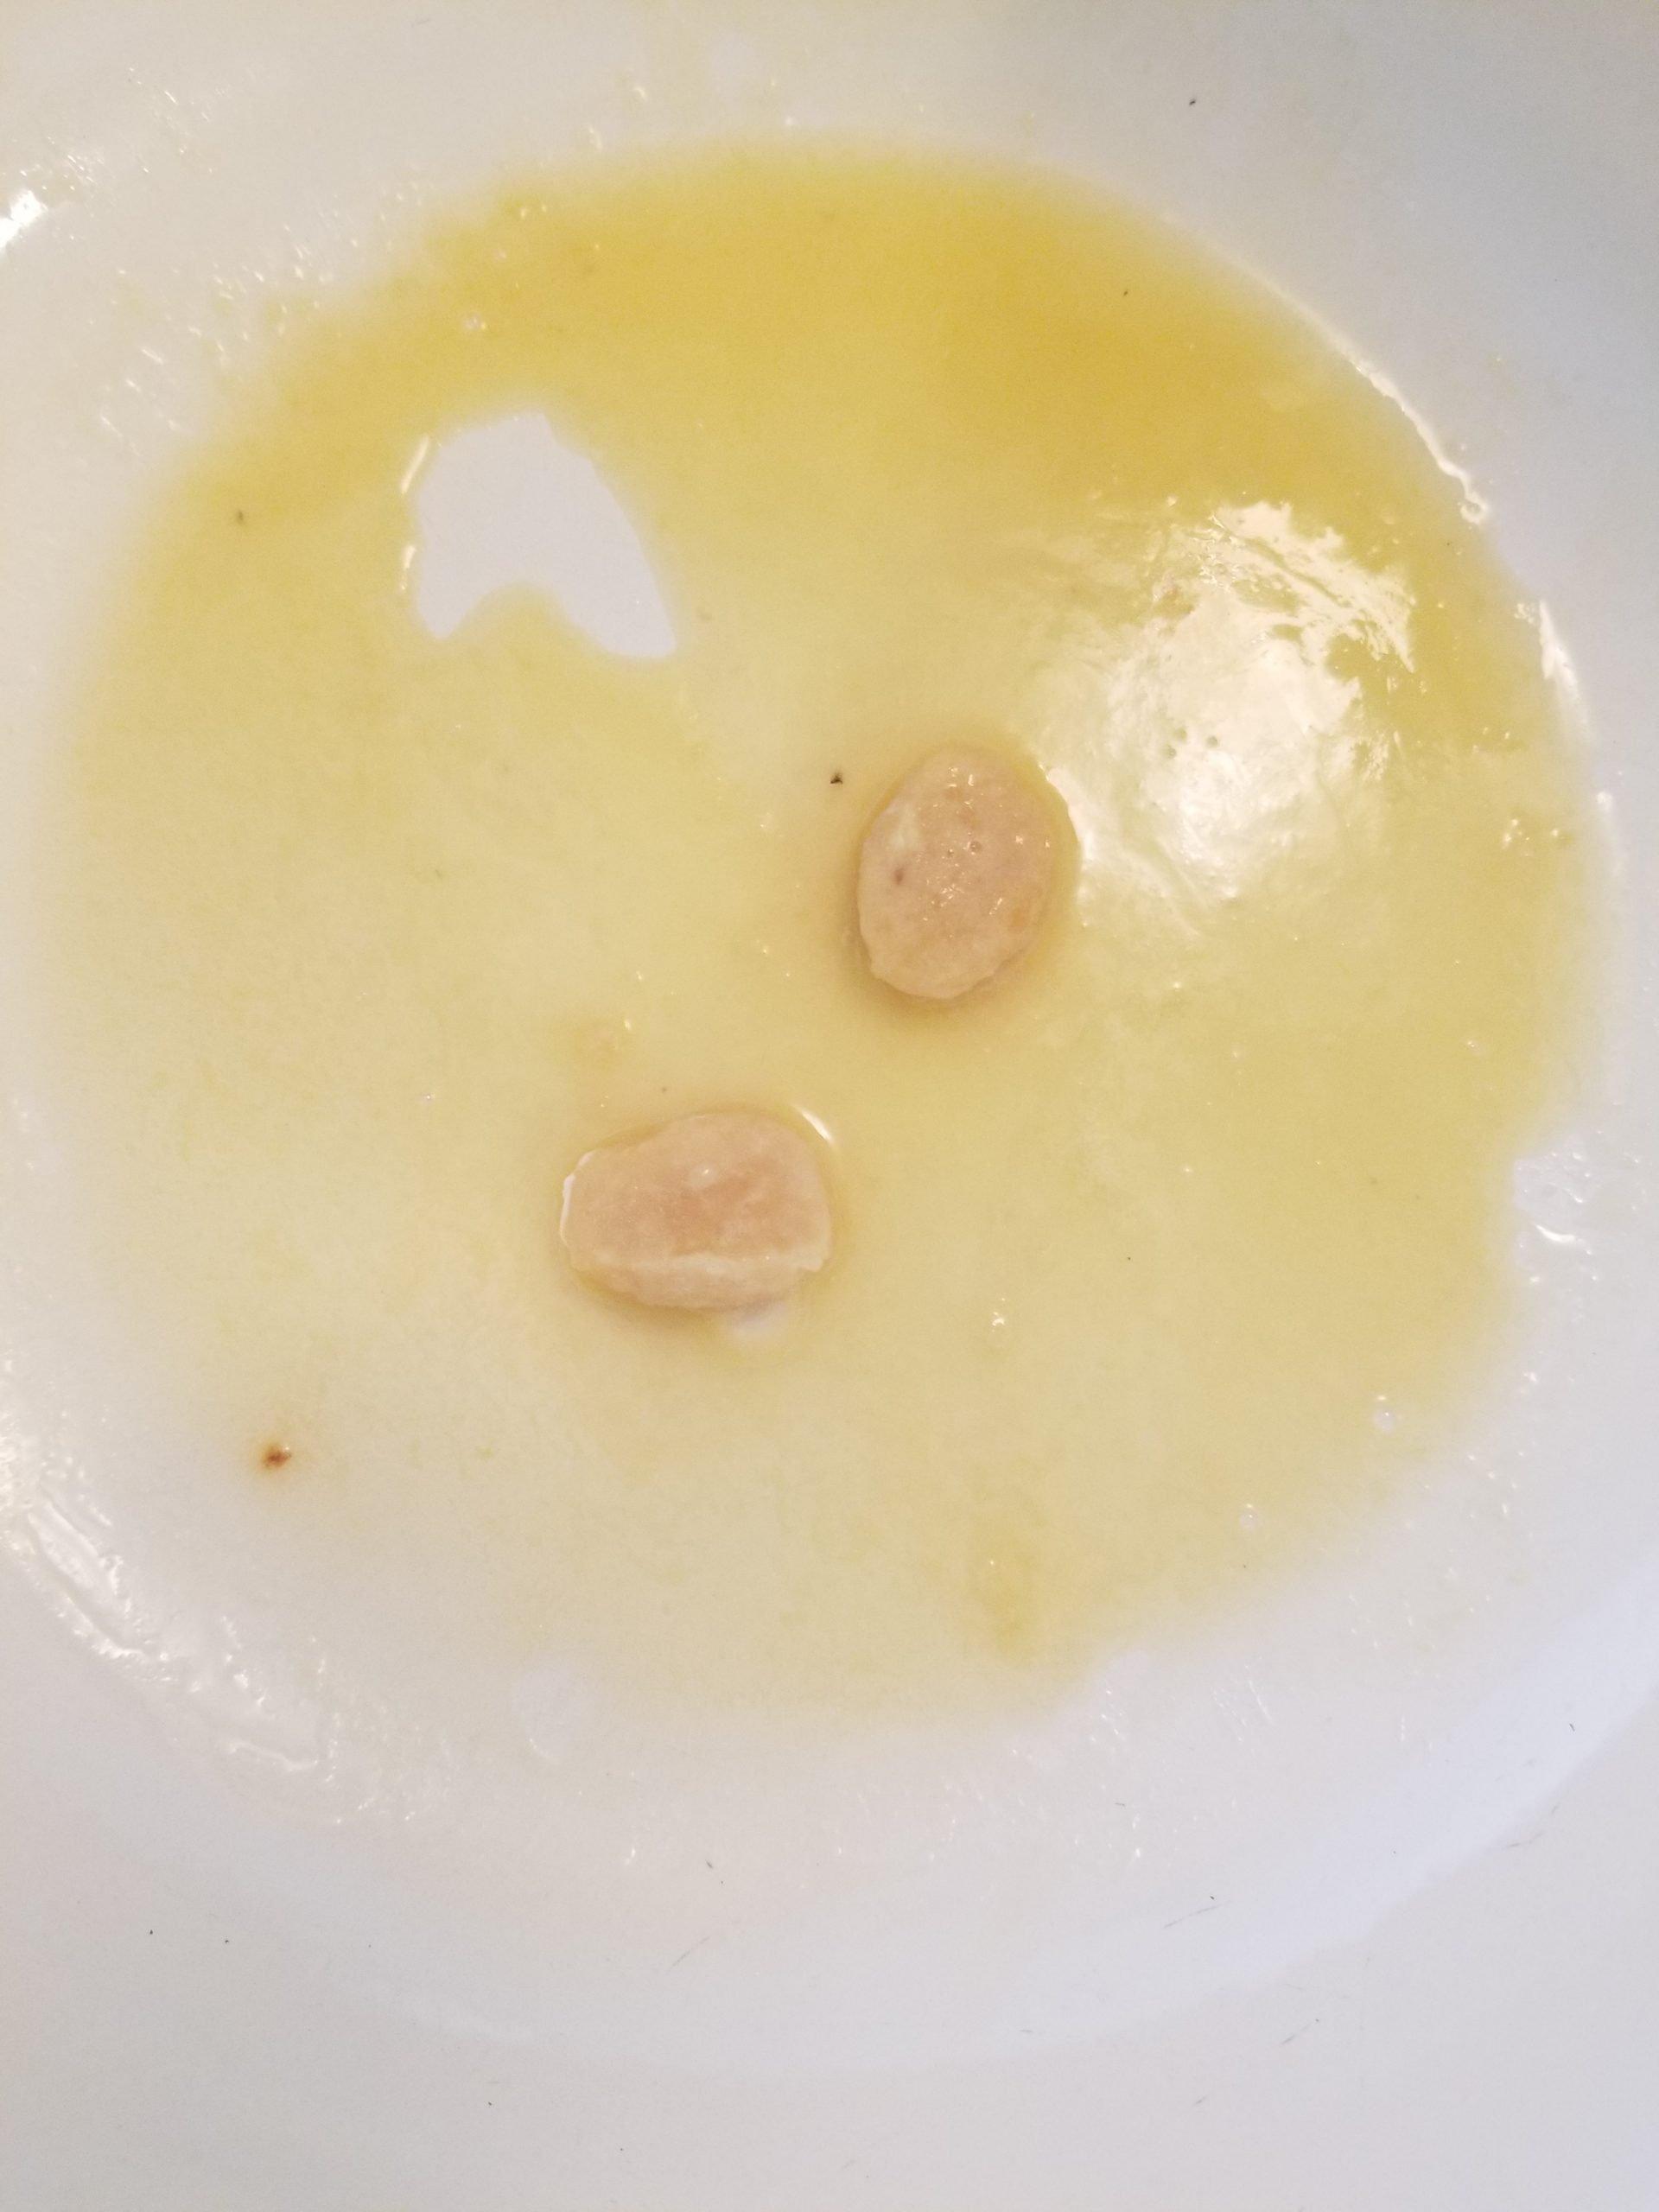 Frozen crushed garlic in melted vegan butter